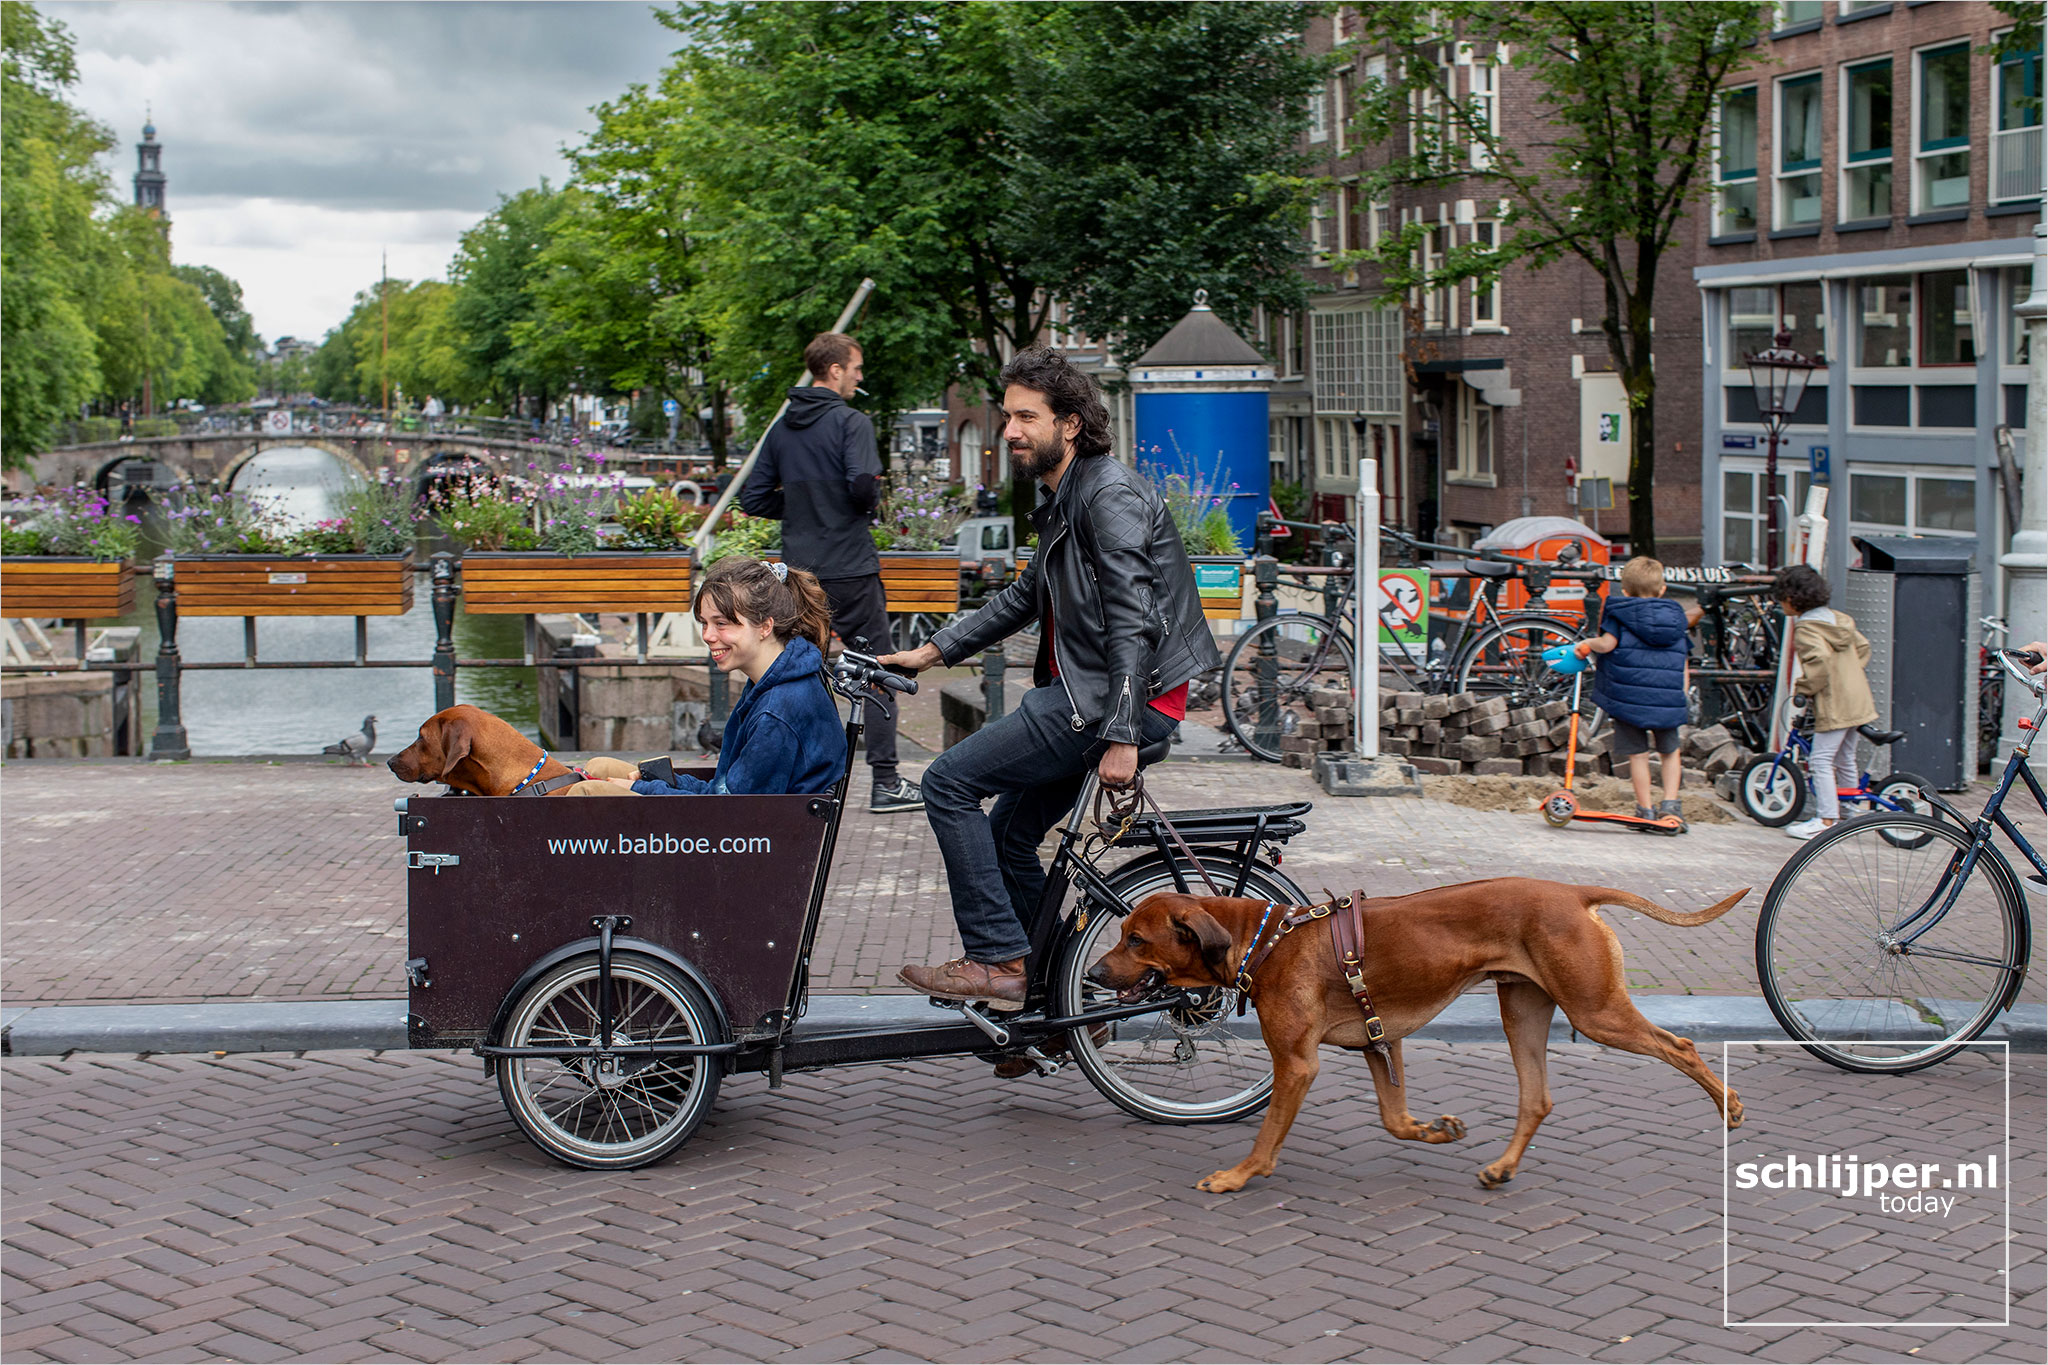 Nederland, Amsterdam, 4 juli 2020